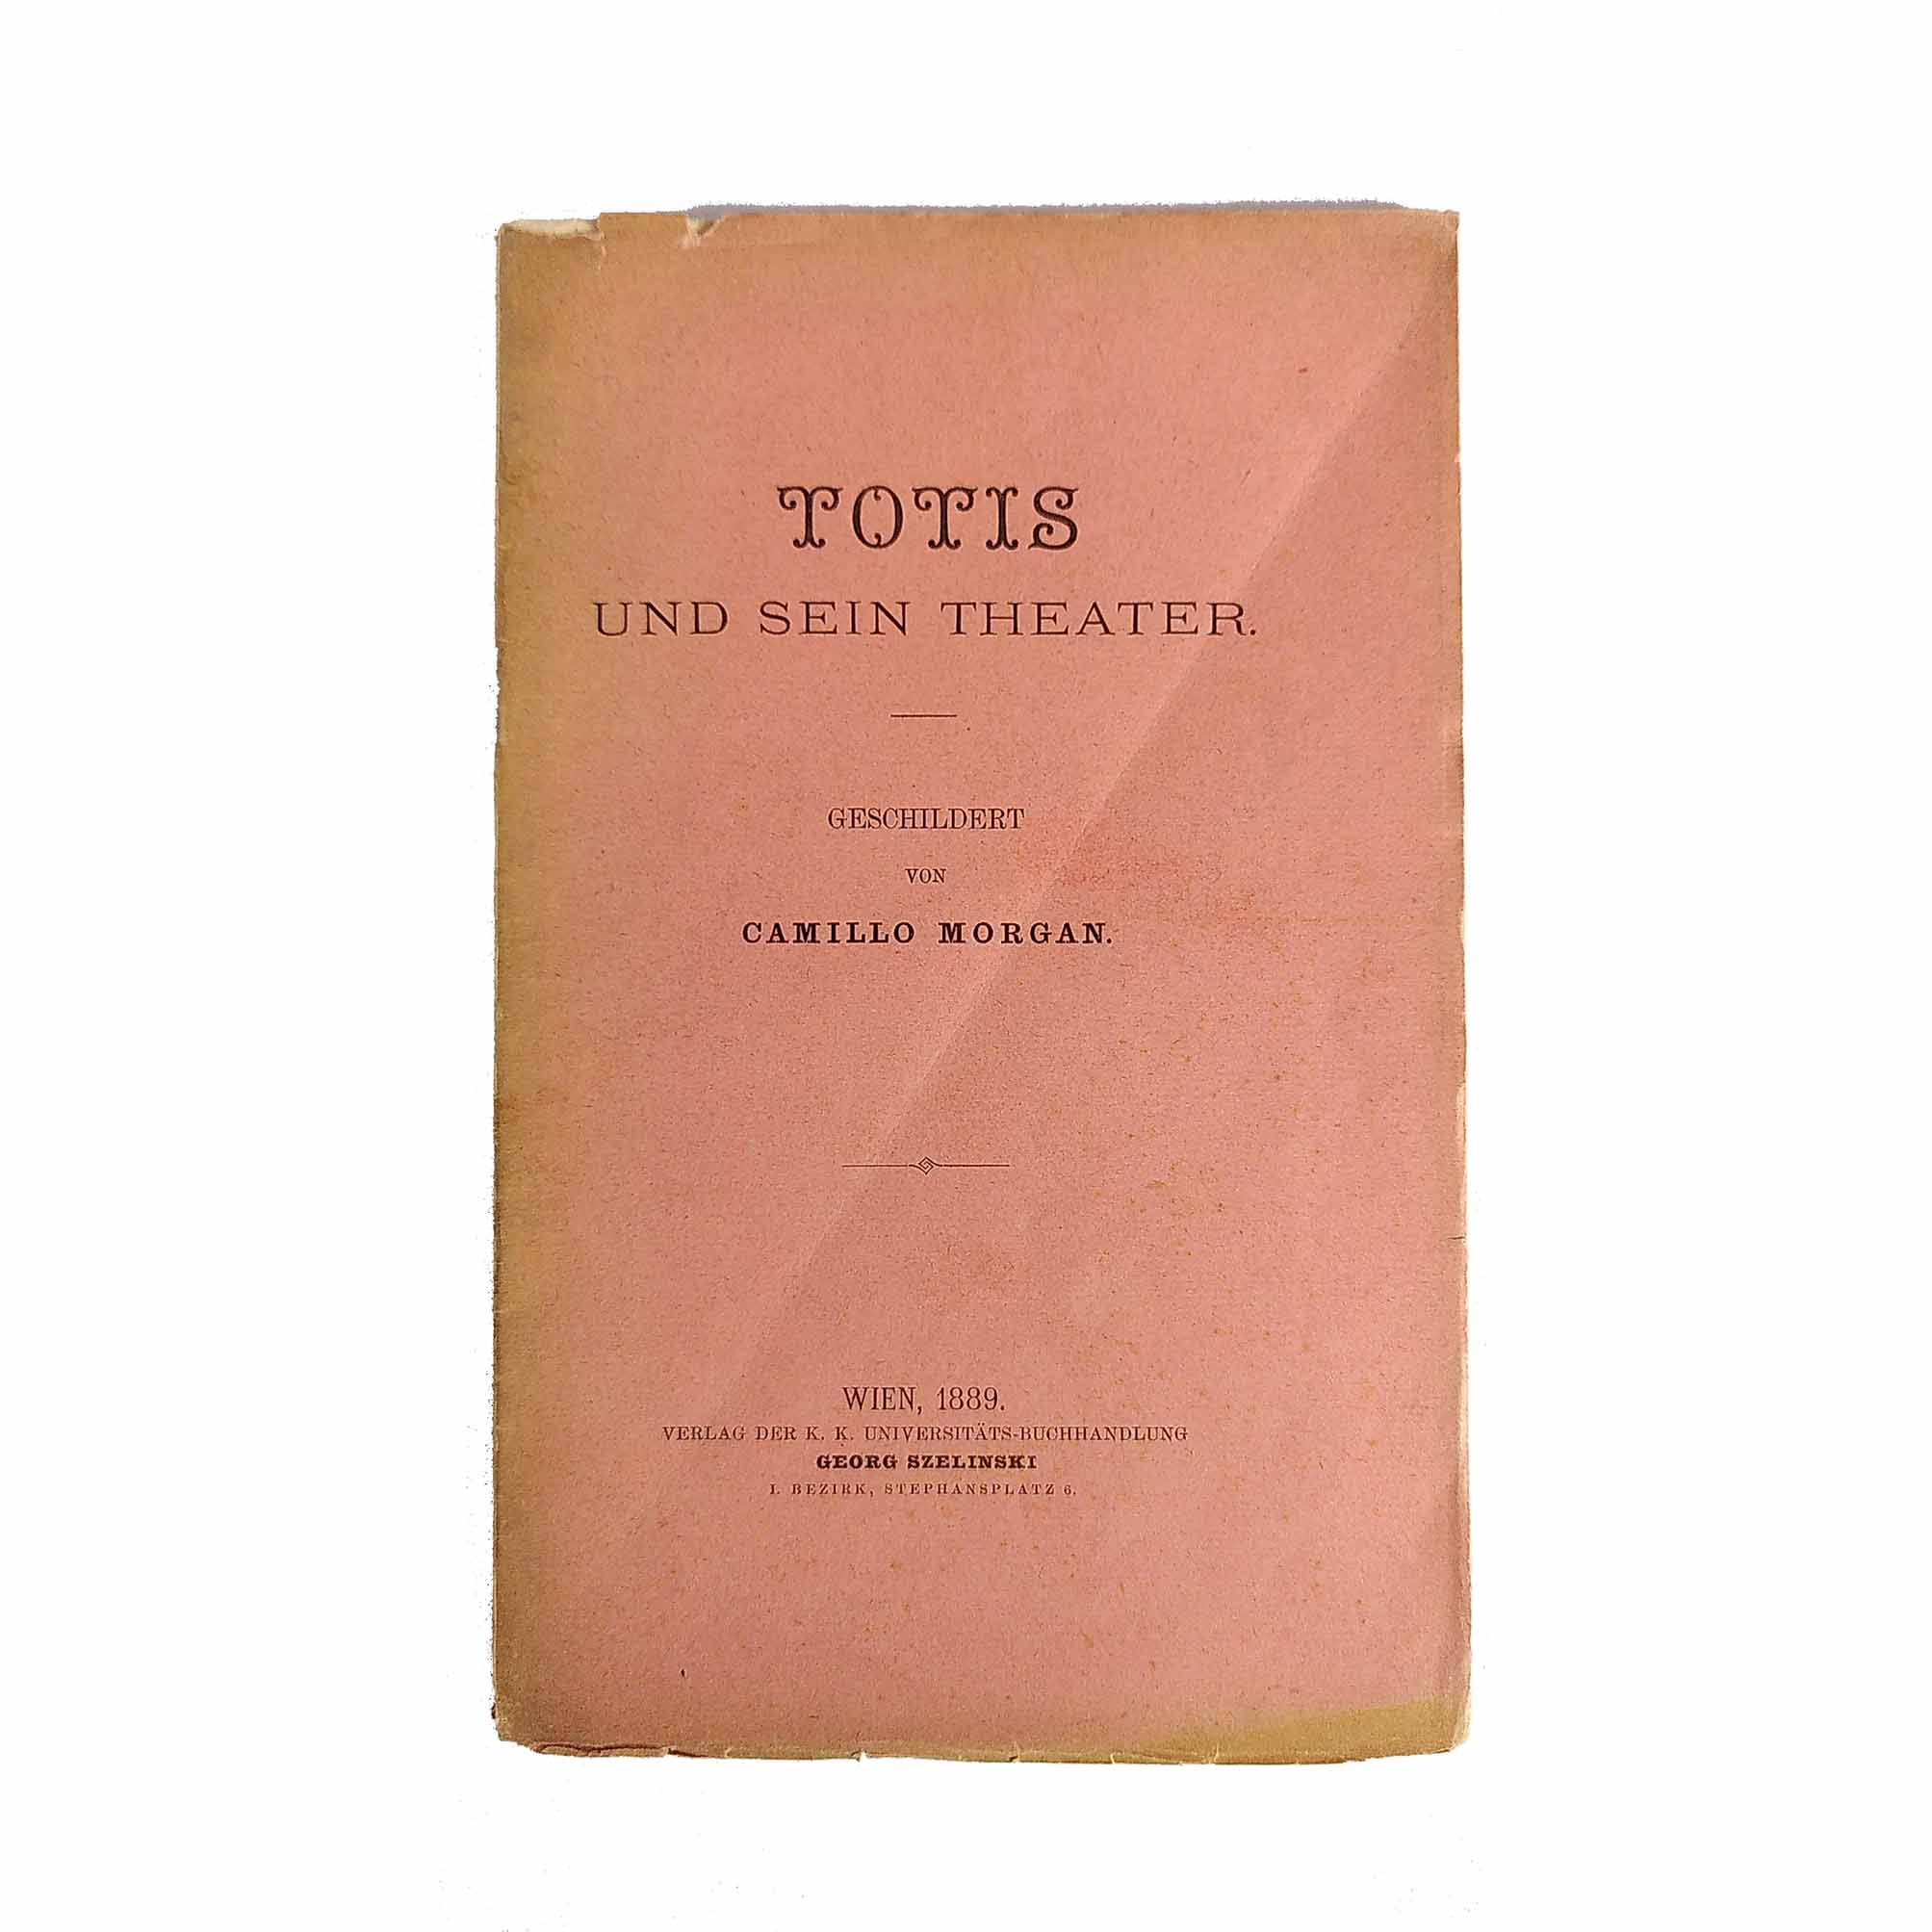 5949-Morgan-Totis-Theater-1889-Umschlag-frei-N.jpg